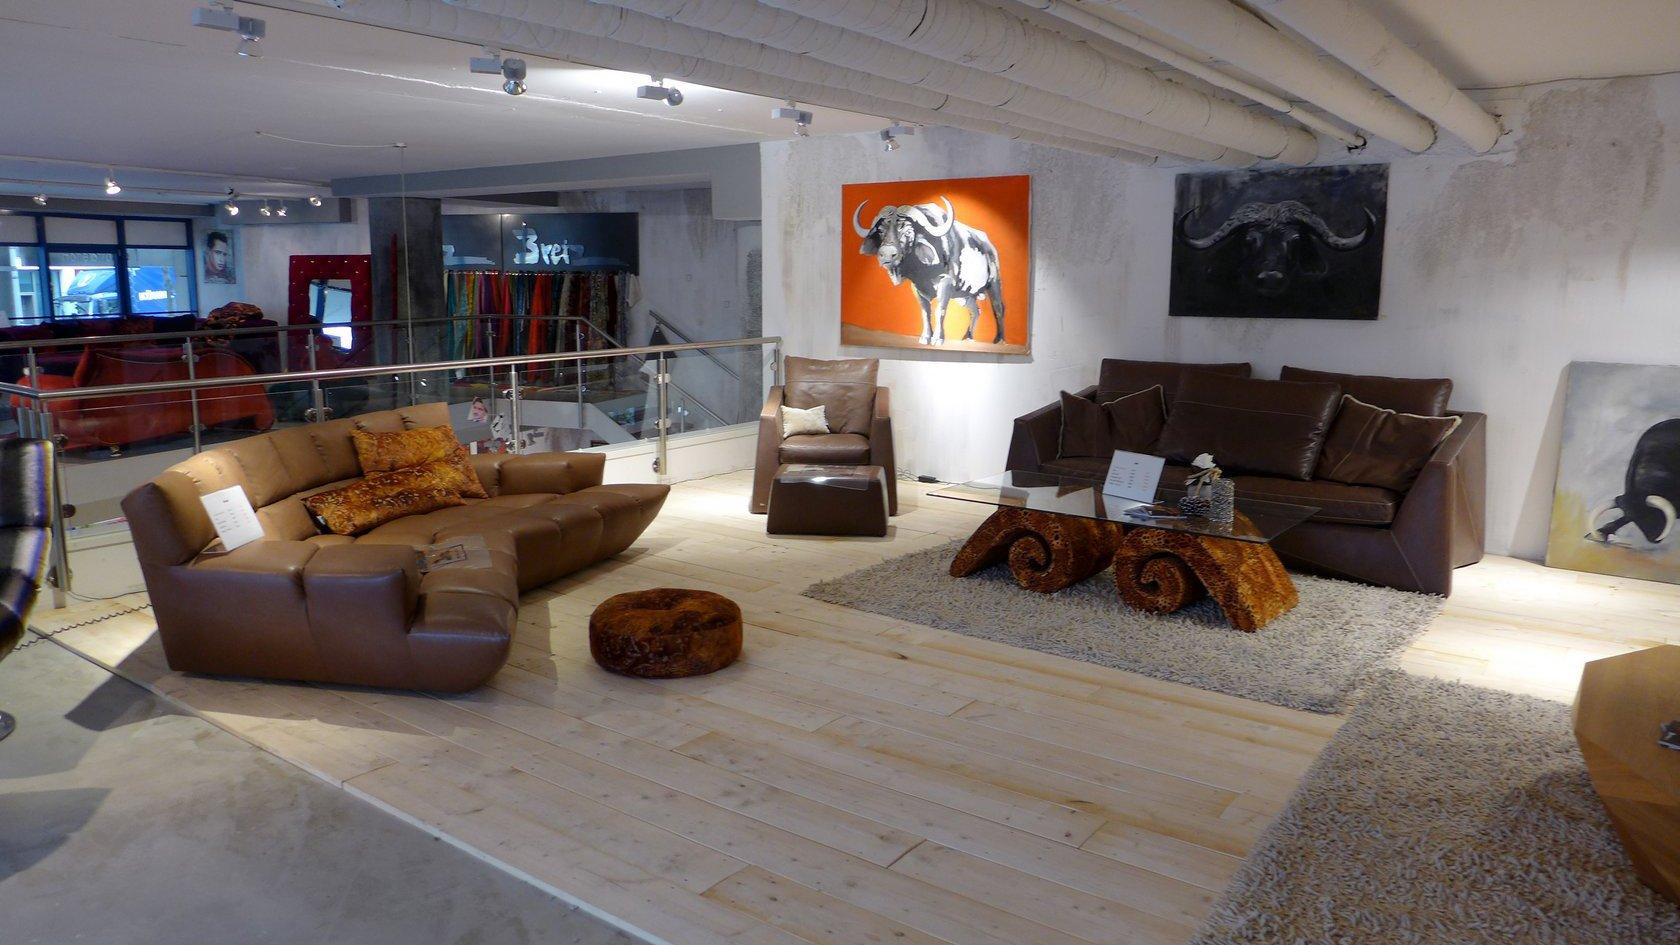 21 bretz dortmund cloud 7 bretz store dortmund. Black Bedroom Furniture Sets. Home Design Ideas